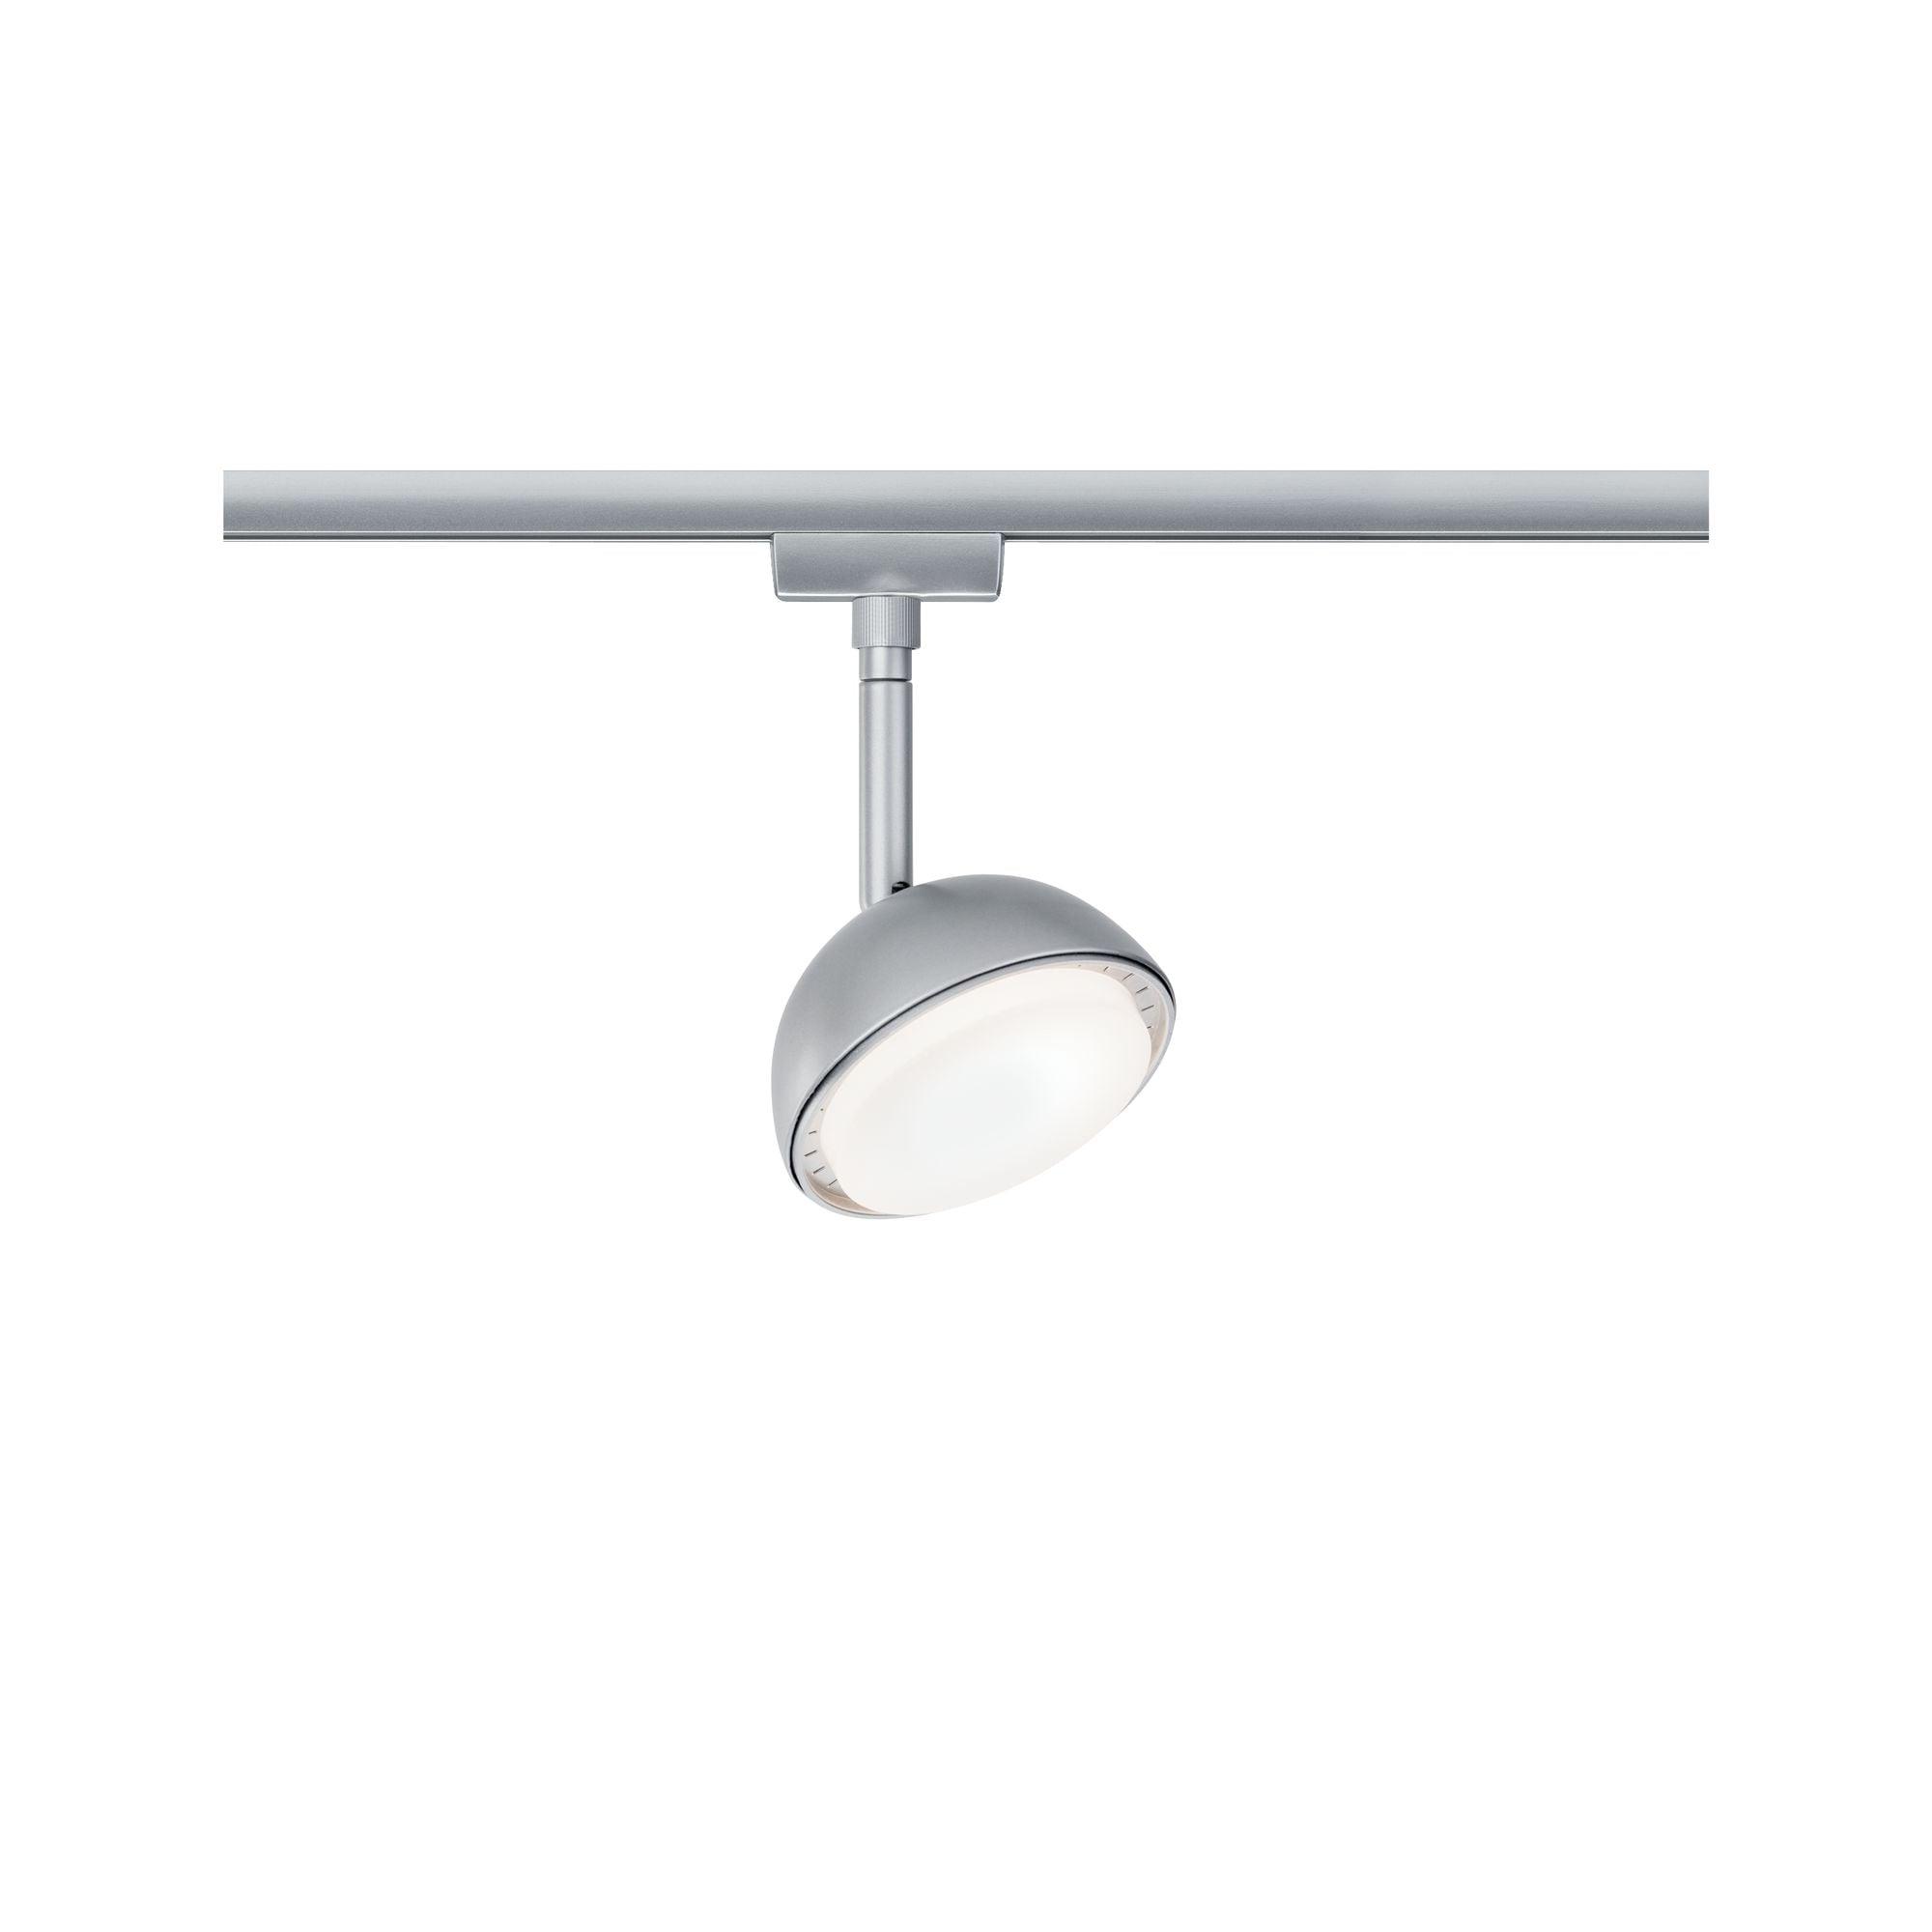 Paulmann LED Deckenleuchte URail LED Spot Hemi Chrom Matt 230V Metall/Kunststoff, 1 St., Warmweiß